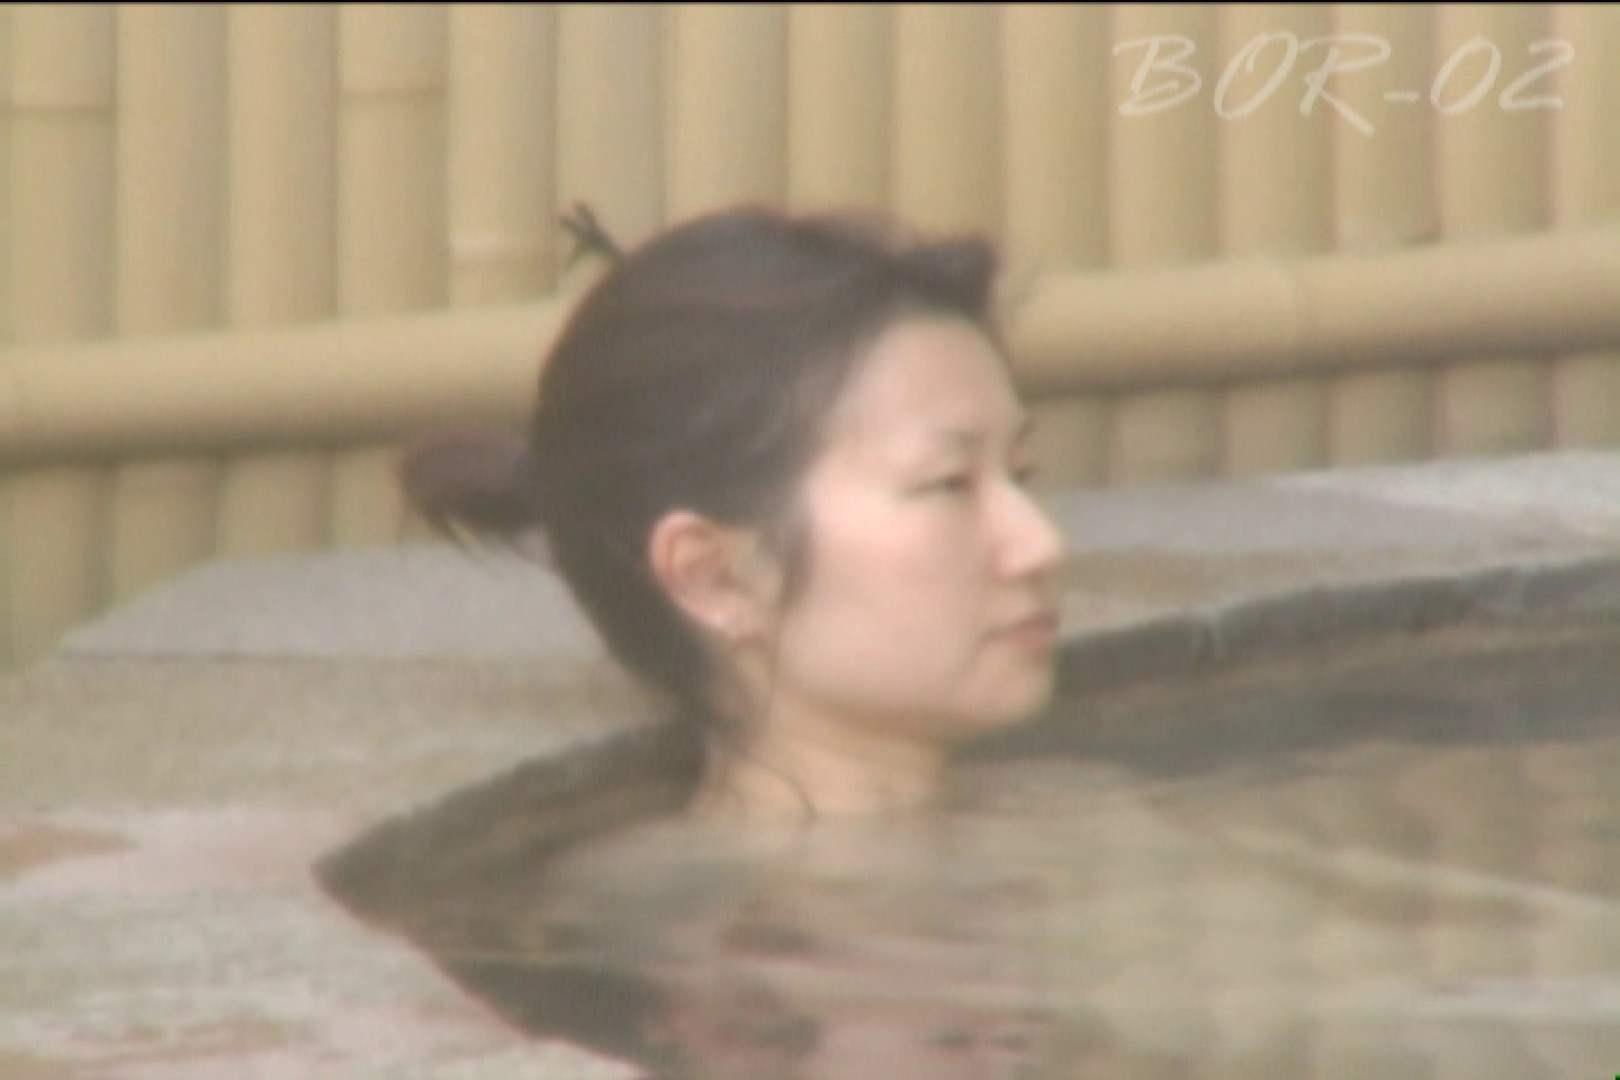 Aquaな露天風呂Vol.477 盗撮  79連発 54